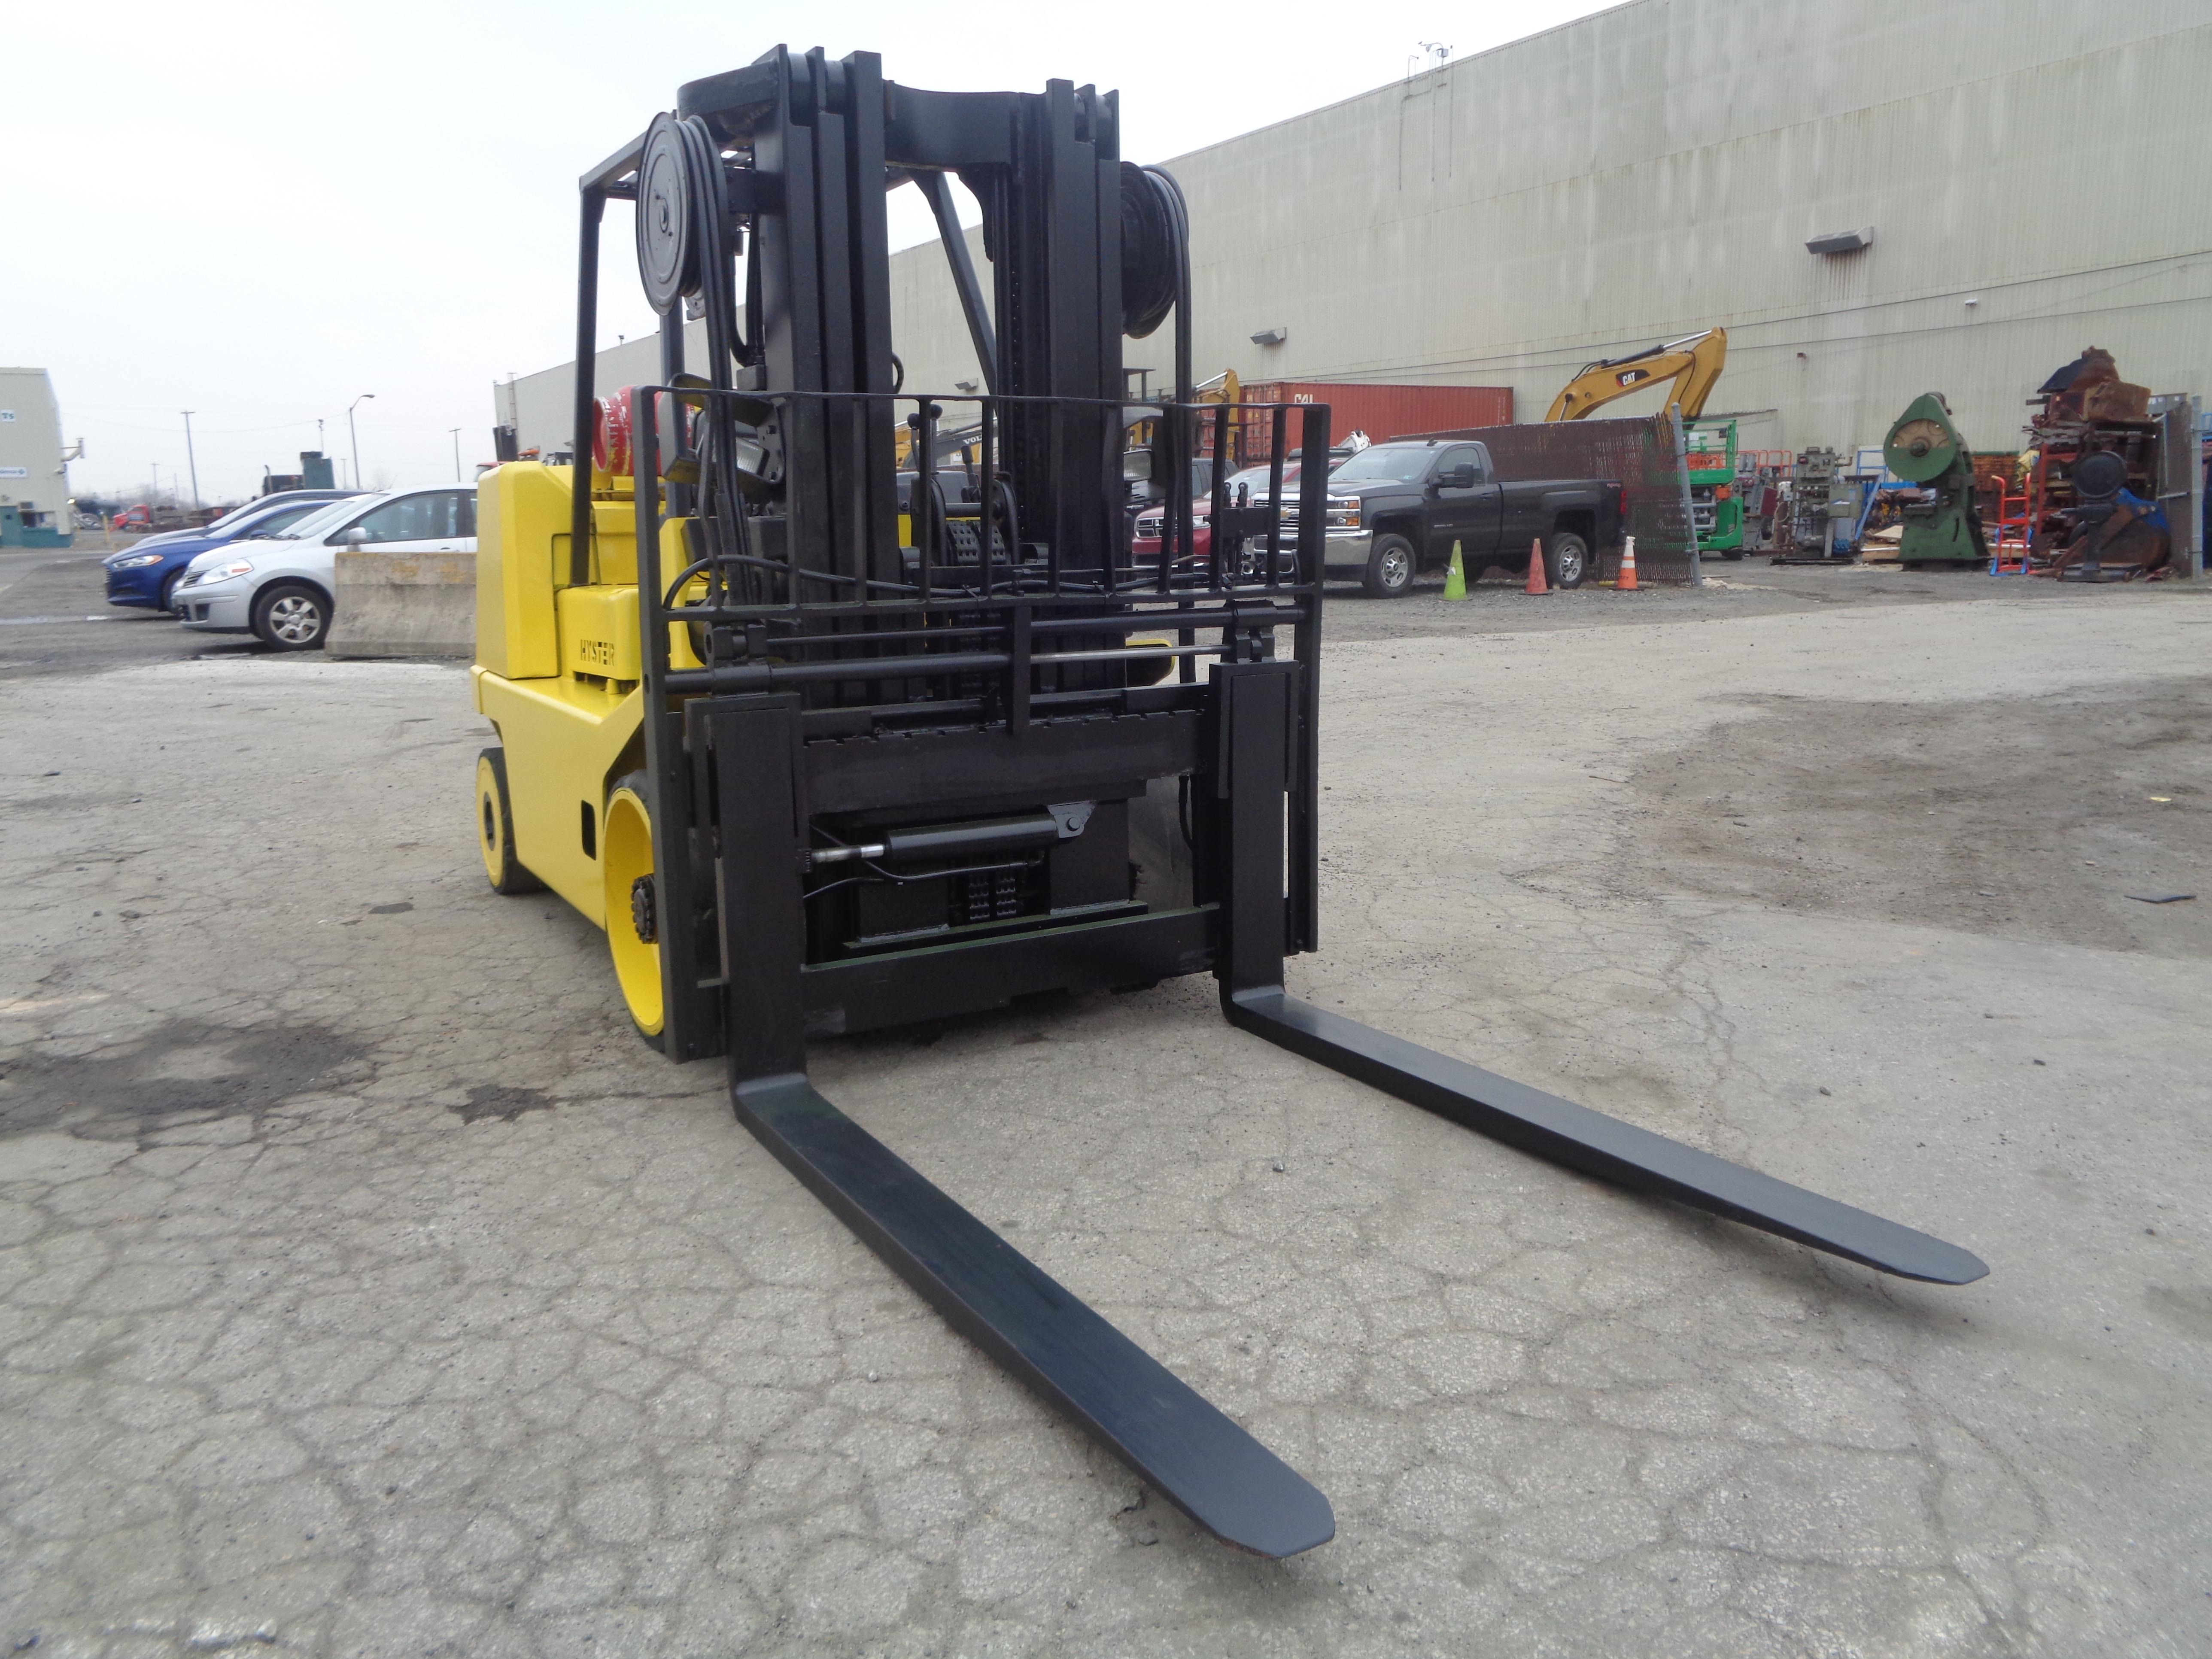 Lot 53 - Hyster S155XL 15500lb Forklift